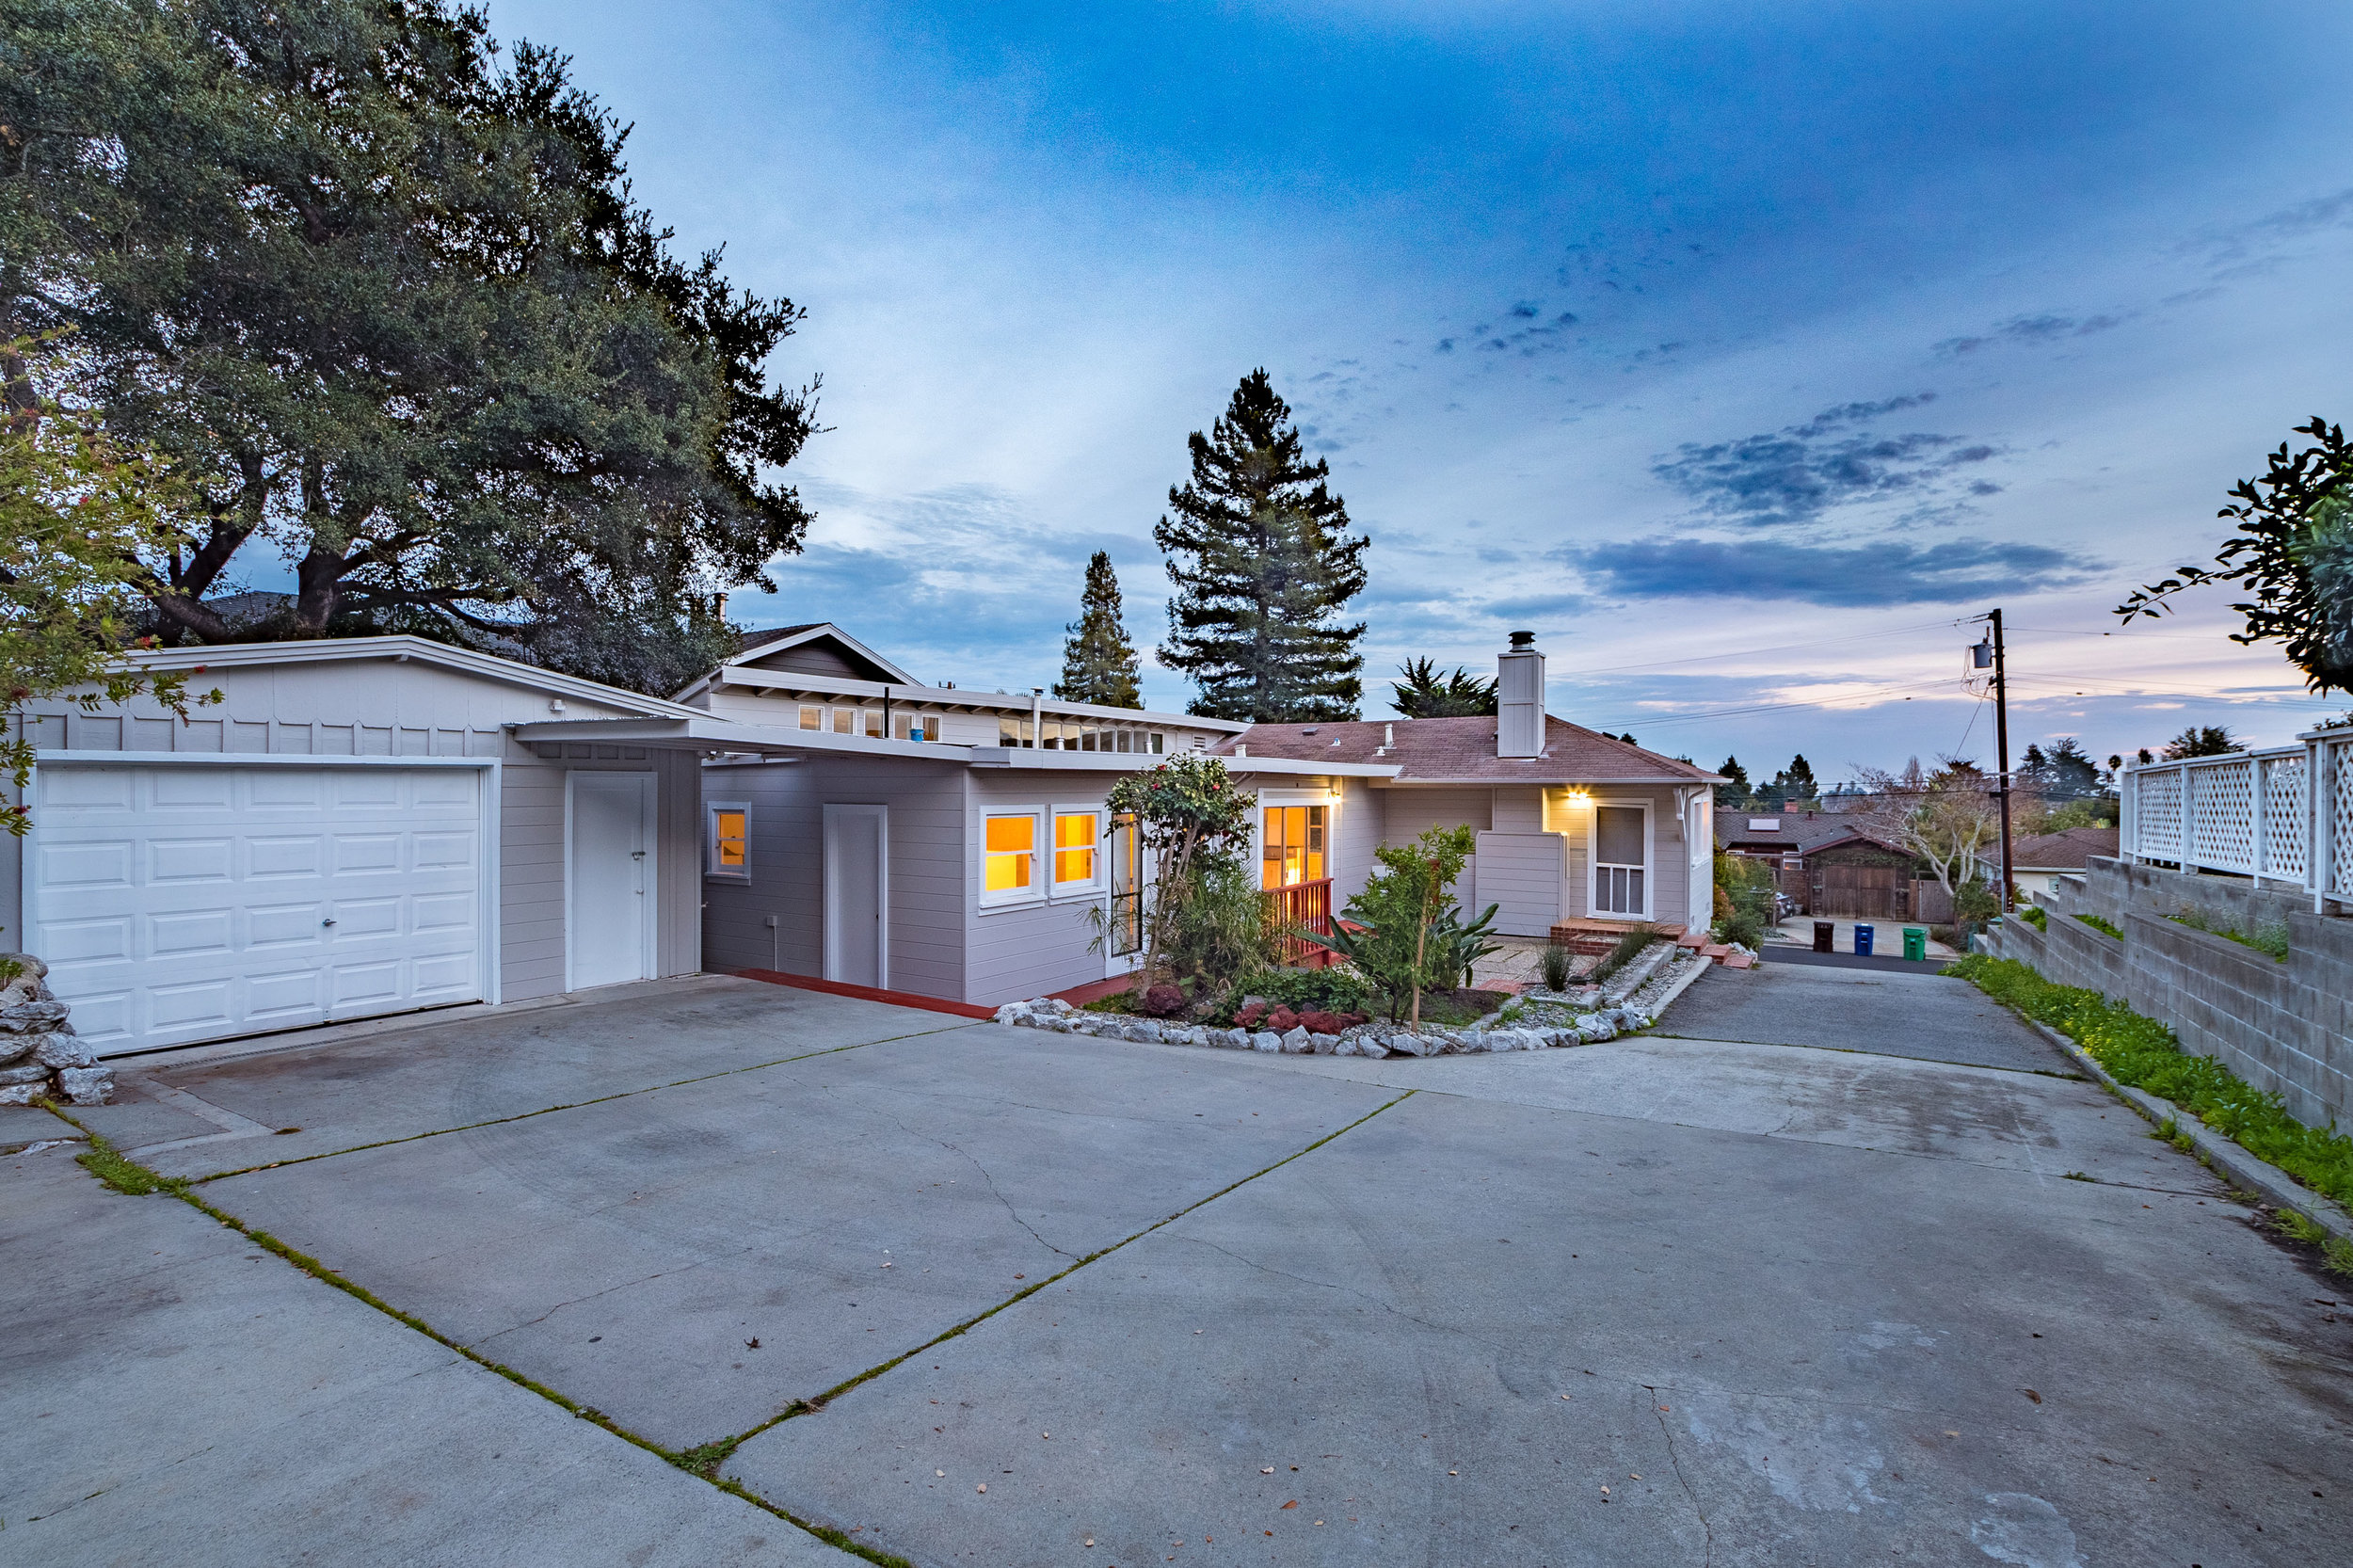 Homes for Sale in Santa Cruz, California